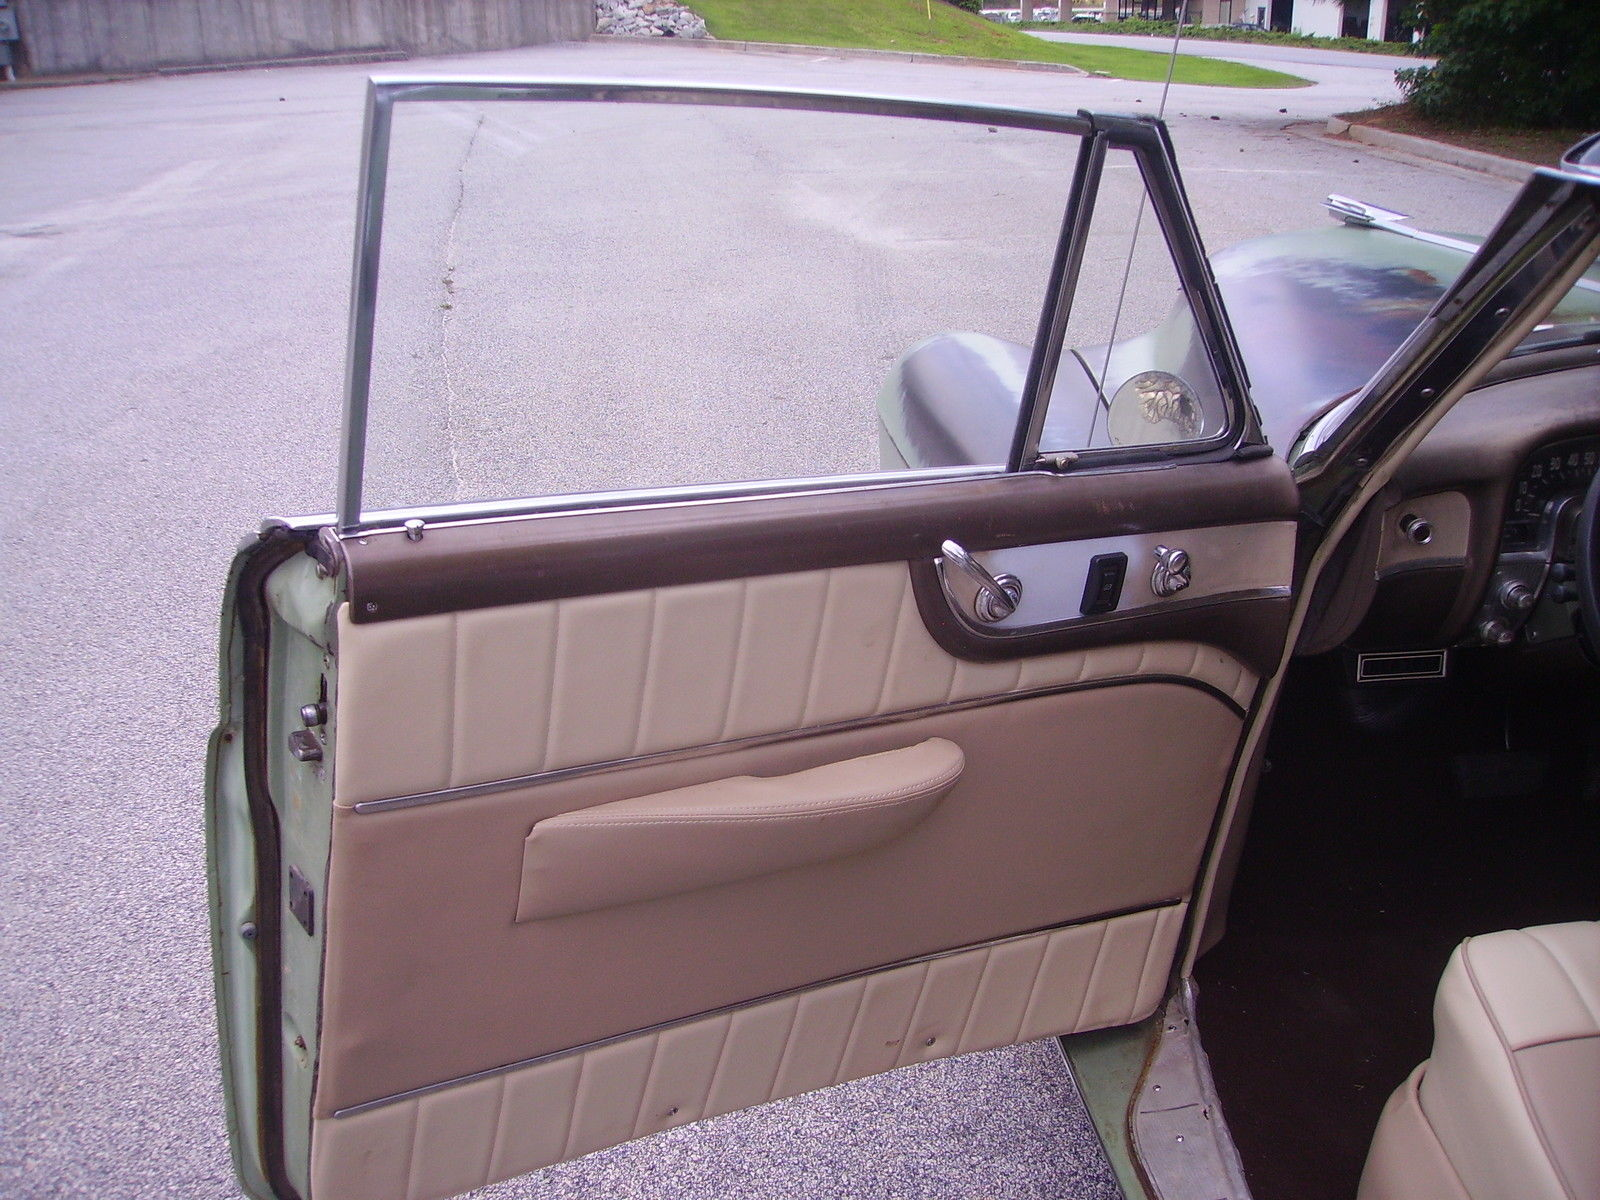 1951 Cadillac Deville Crate 350 Engine P S B A C New Interior Nova Sedan Sub Frame